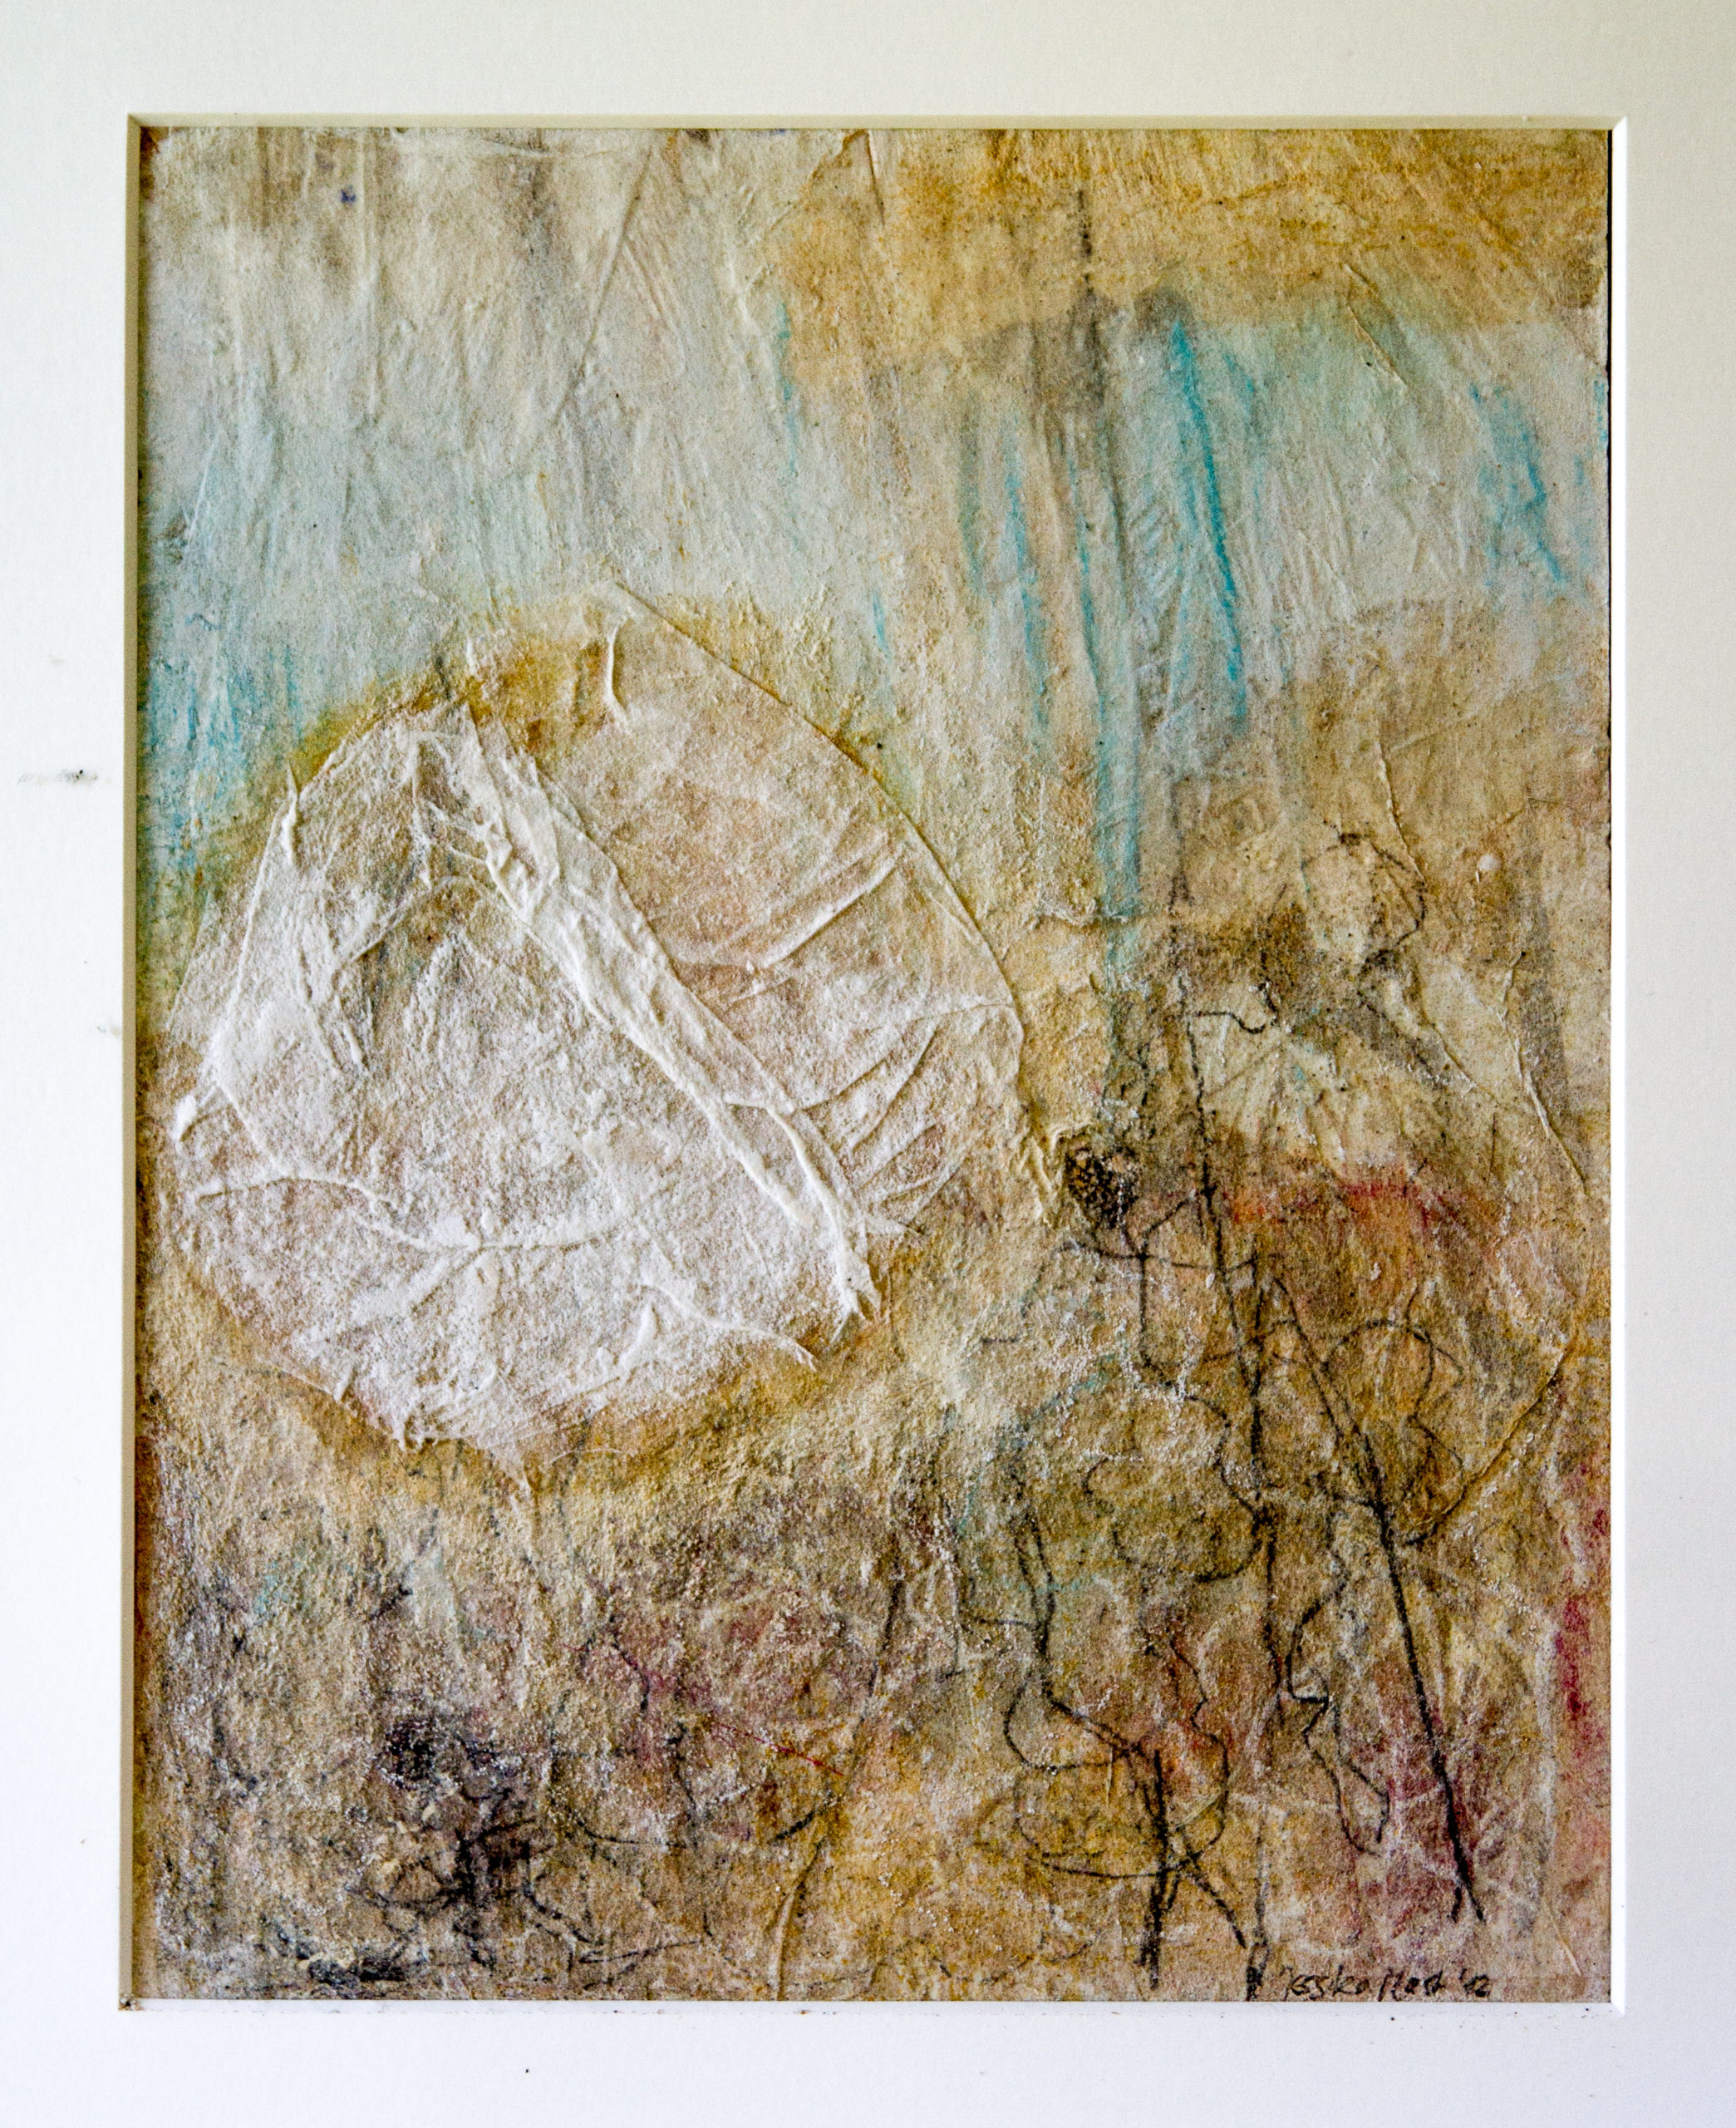 Nebelliebe 4: 30x40,Acryl, Gesteinsmehle, Bleistift, Kreide, Papier auf Papier oder OSB,2012